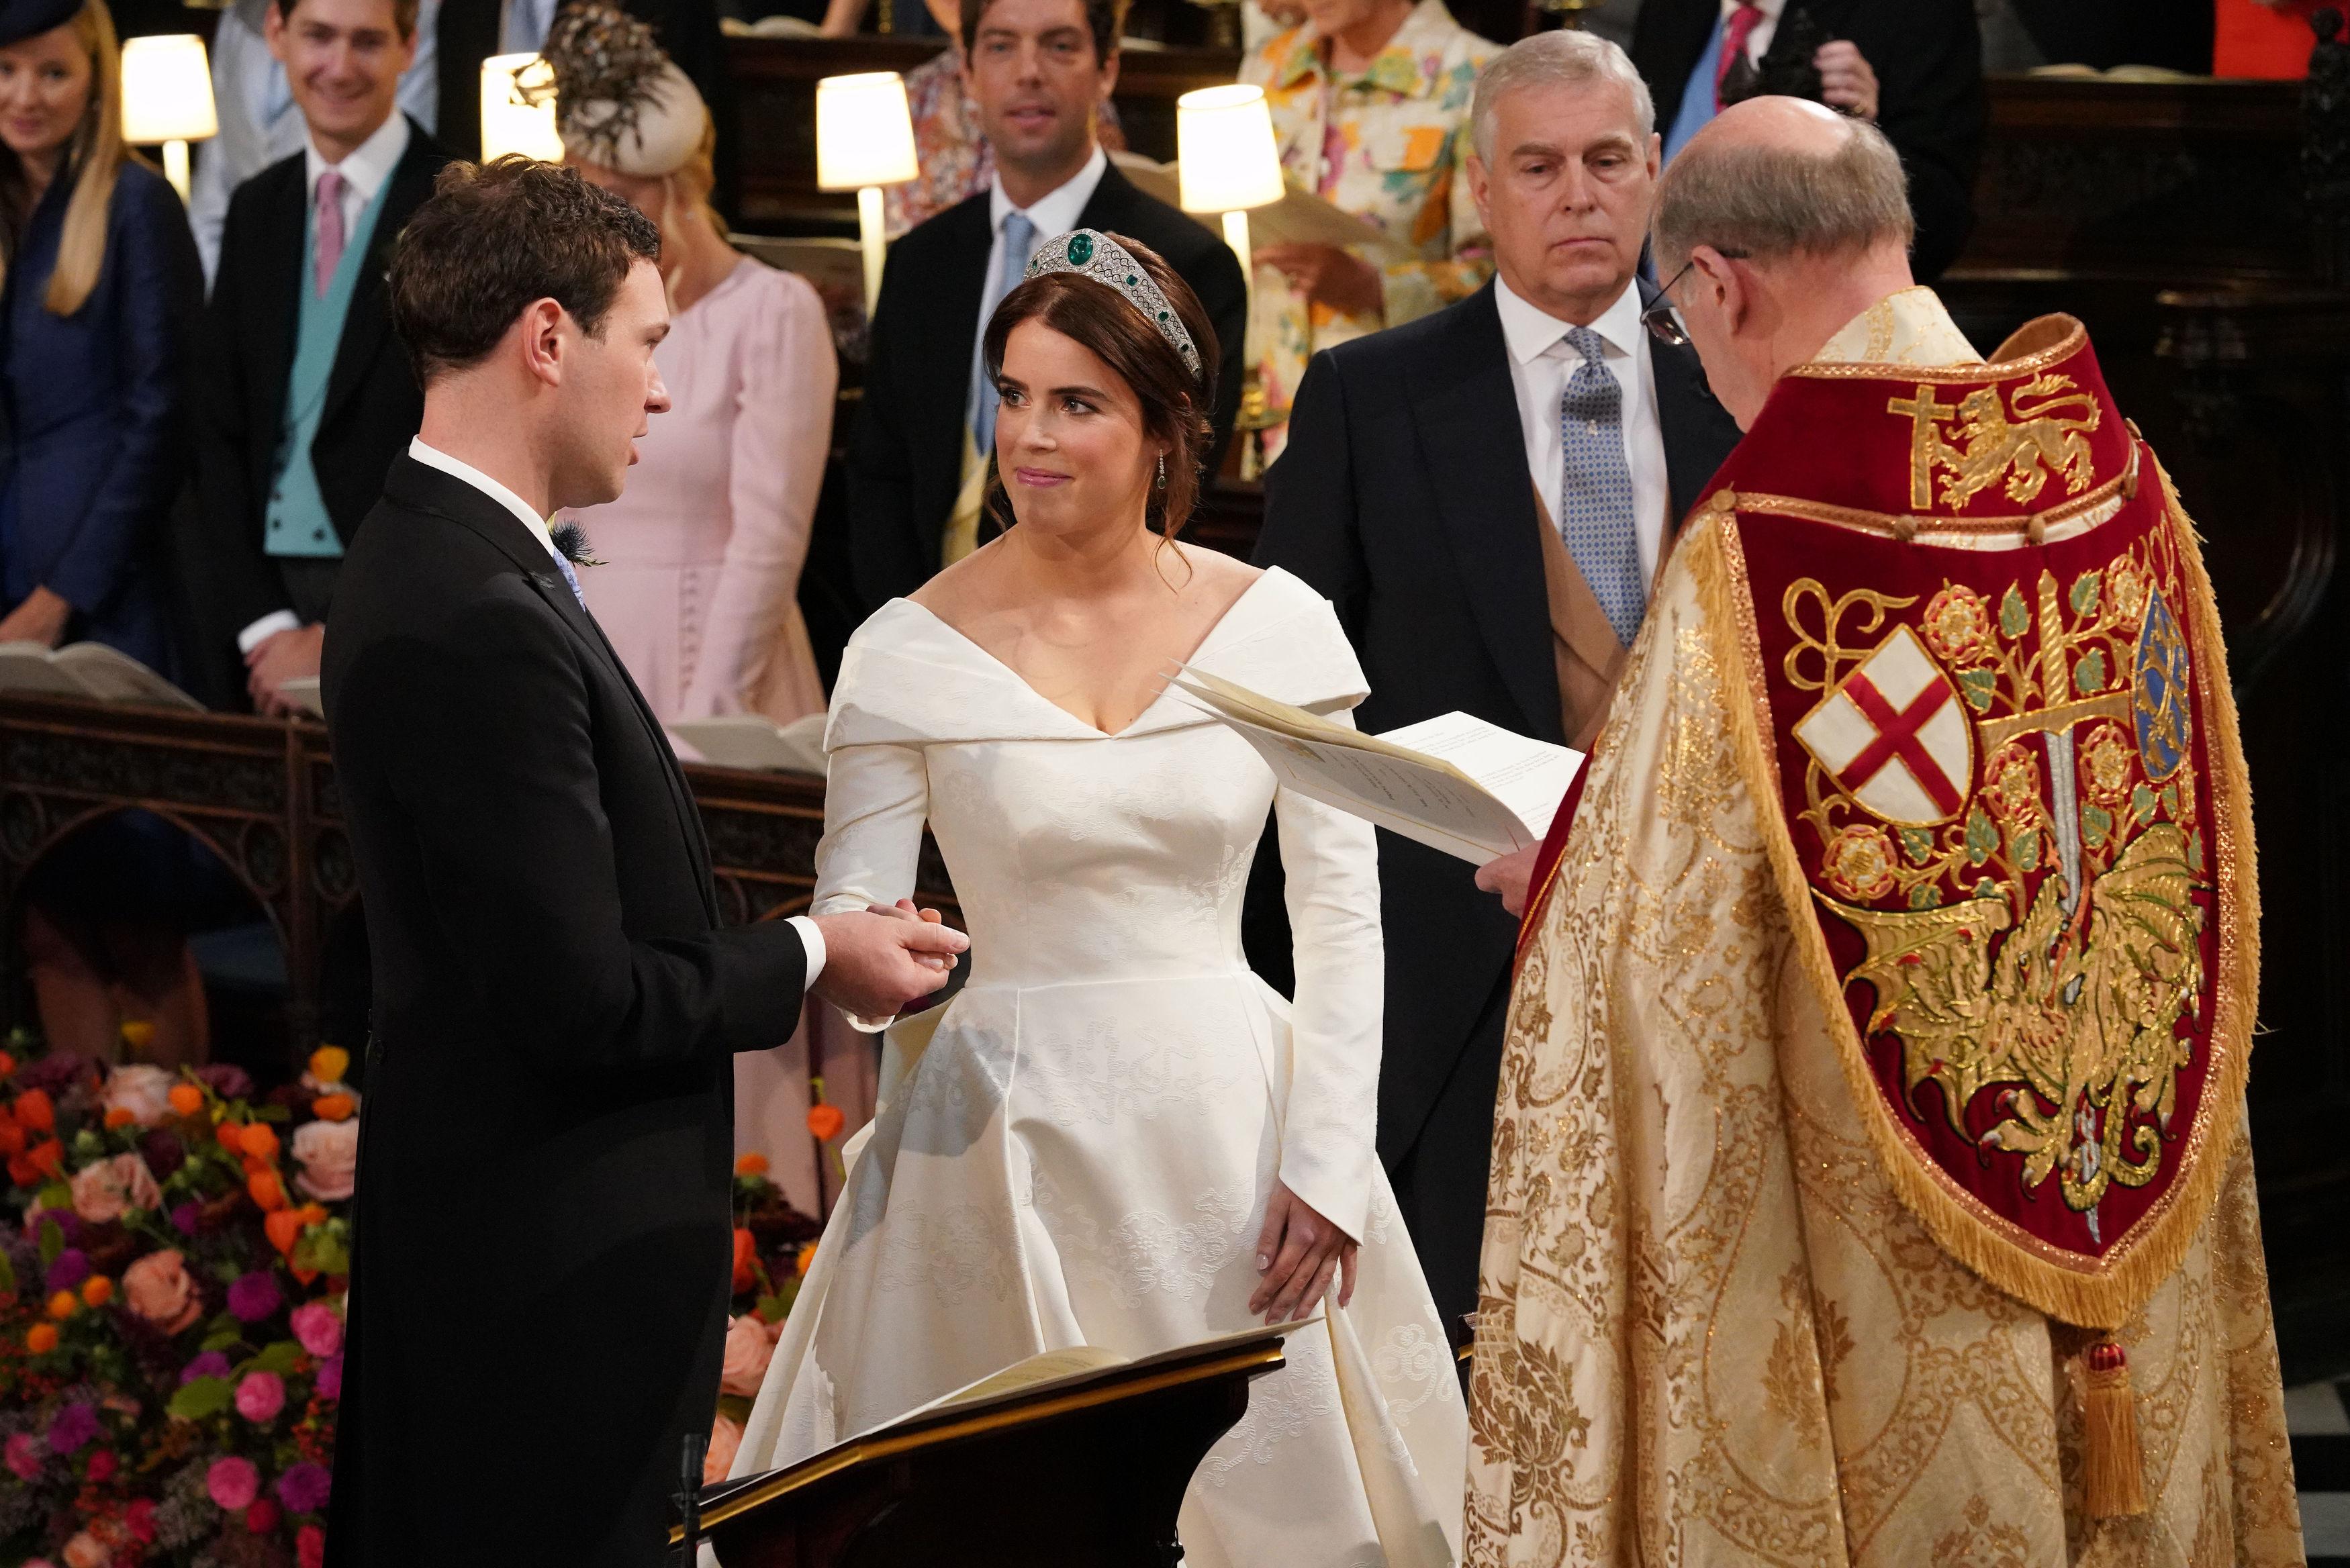 casamento-princesa-eugenie-jack-brooksbank